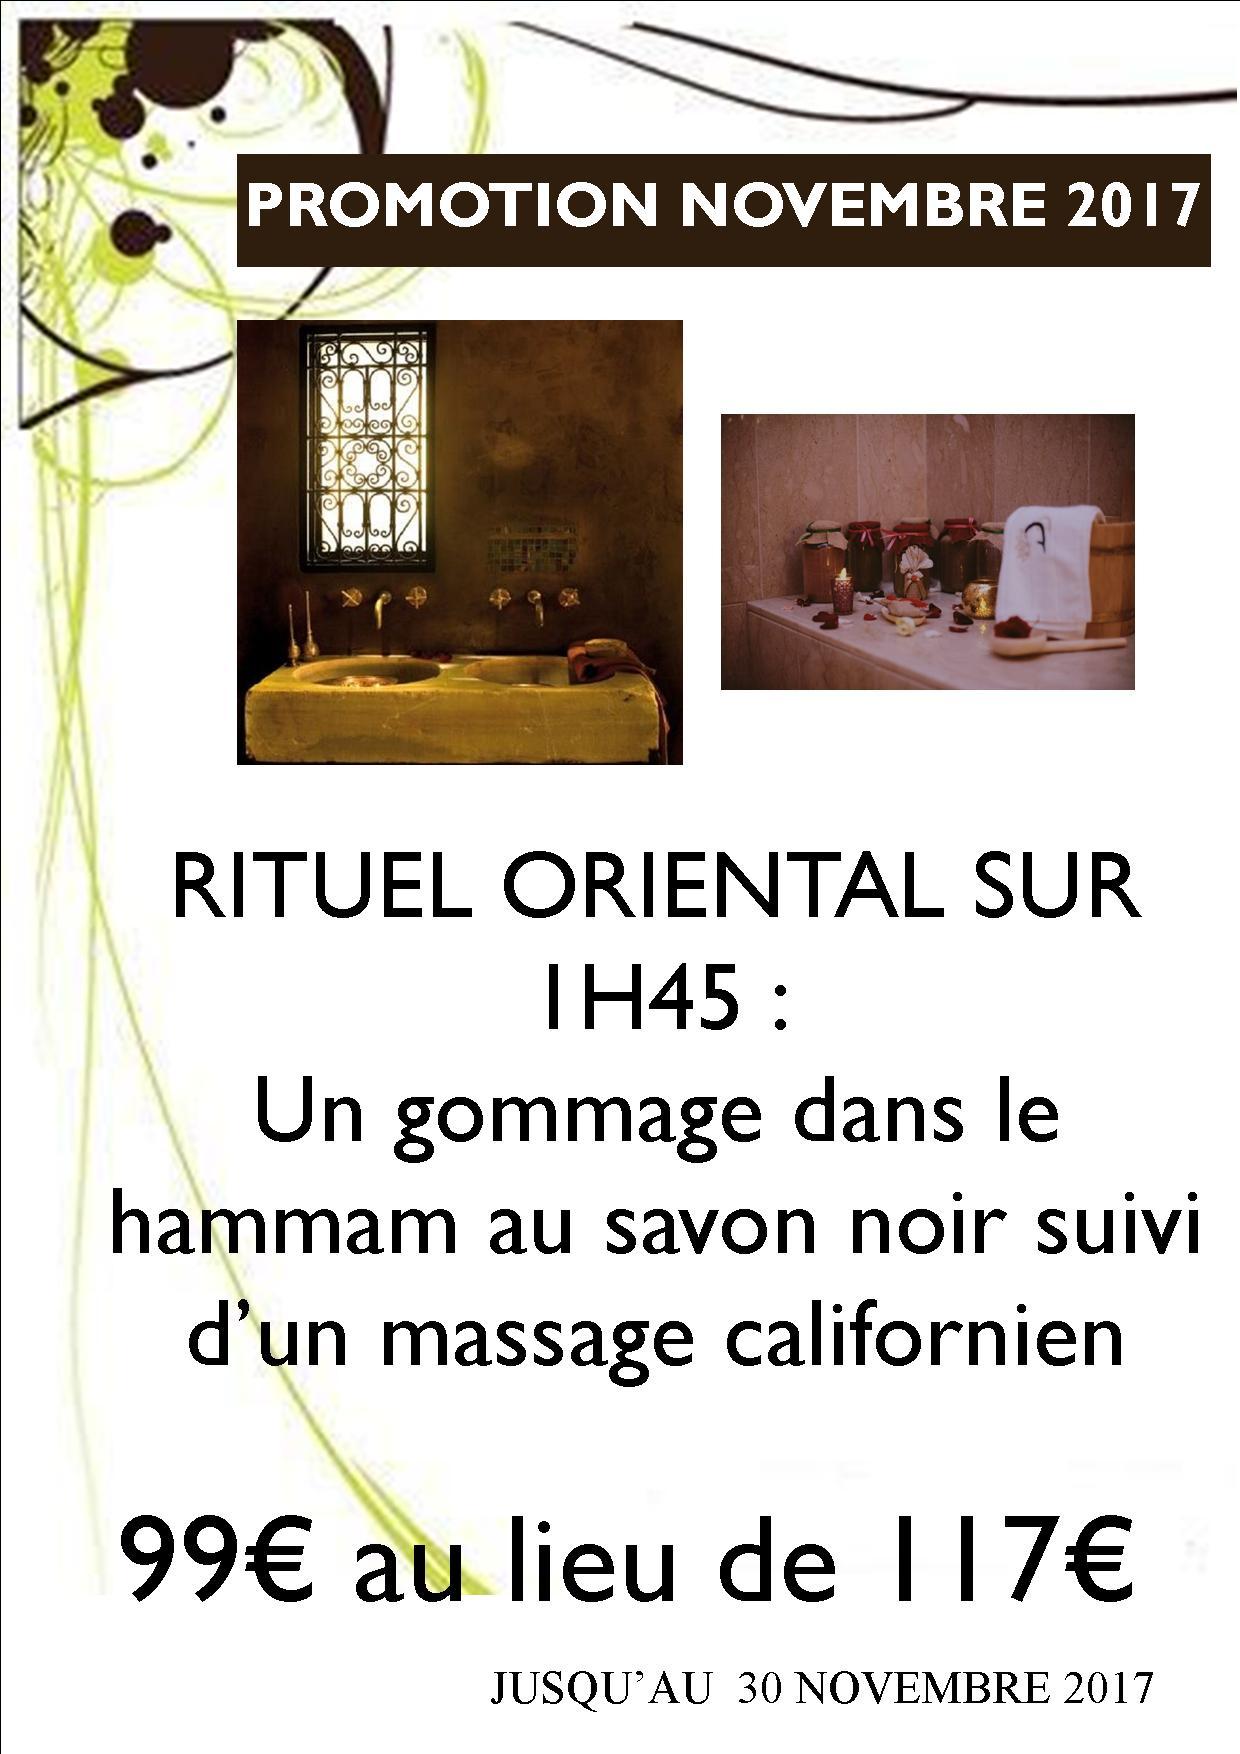 Rituel oriental 1H45